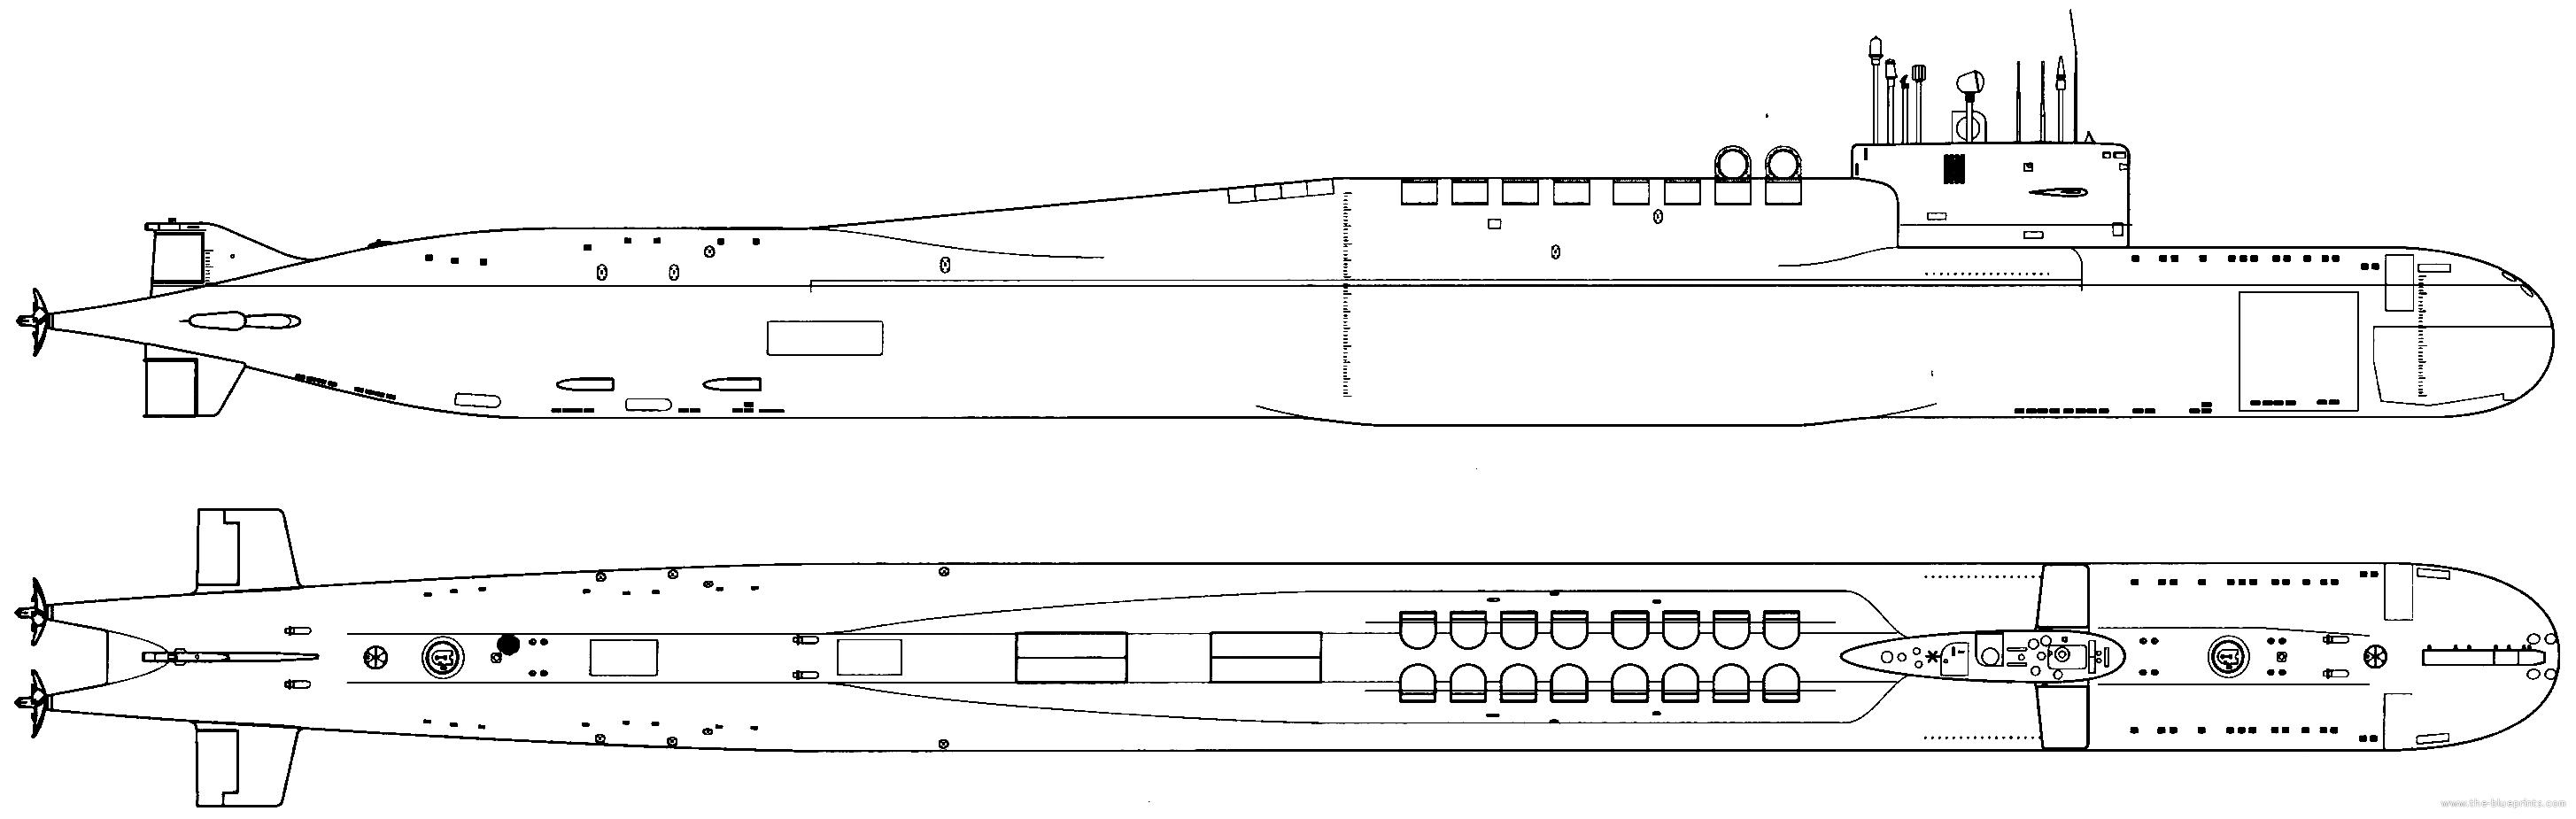 ussr-project-667bdrm-delfin-delta-iv-class-submarine-2